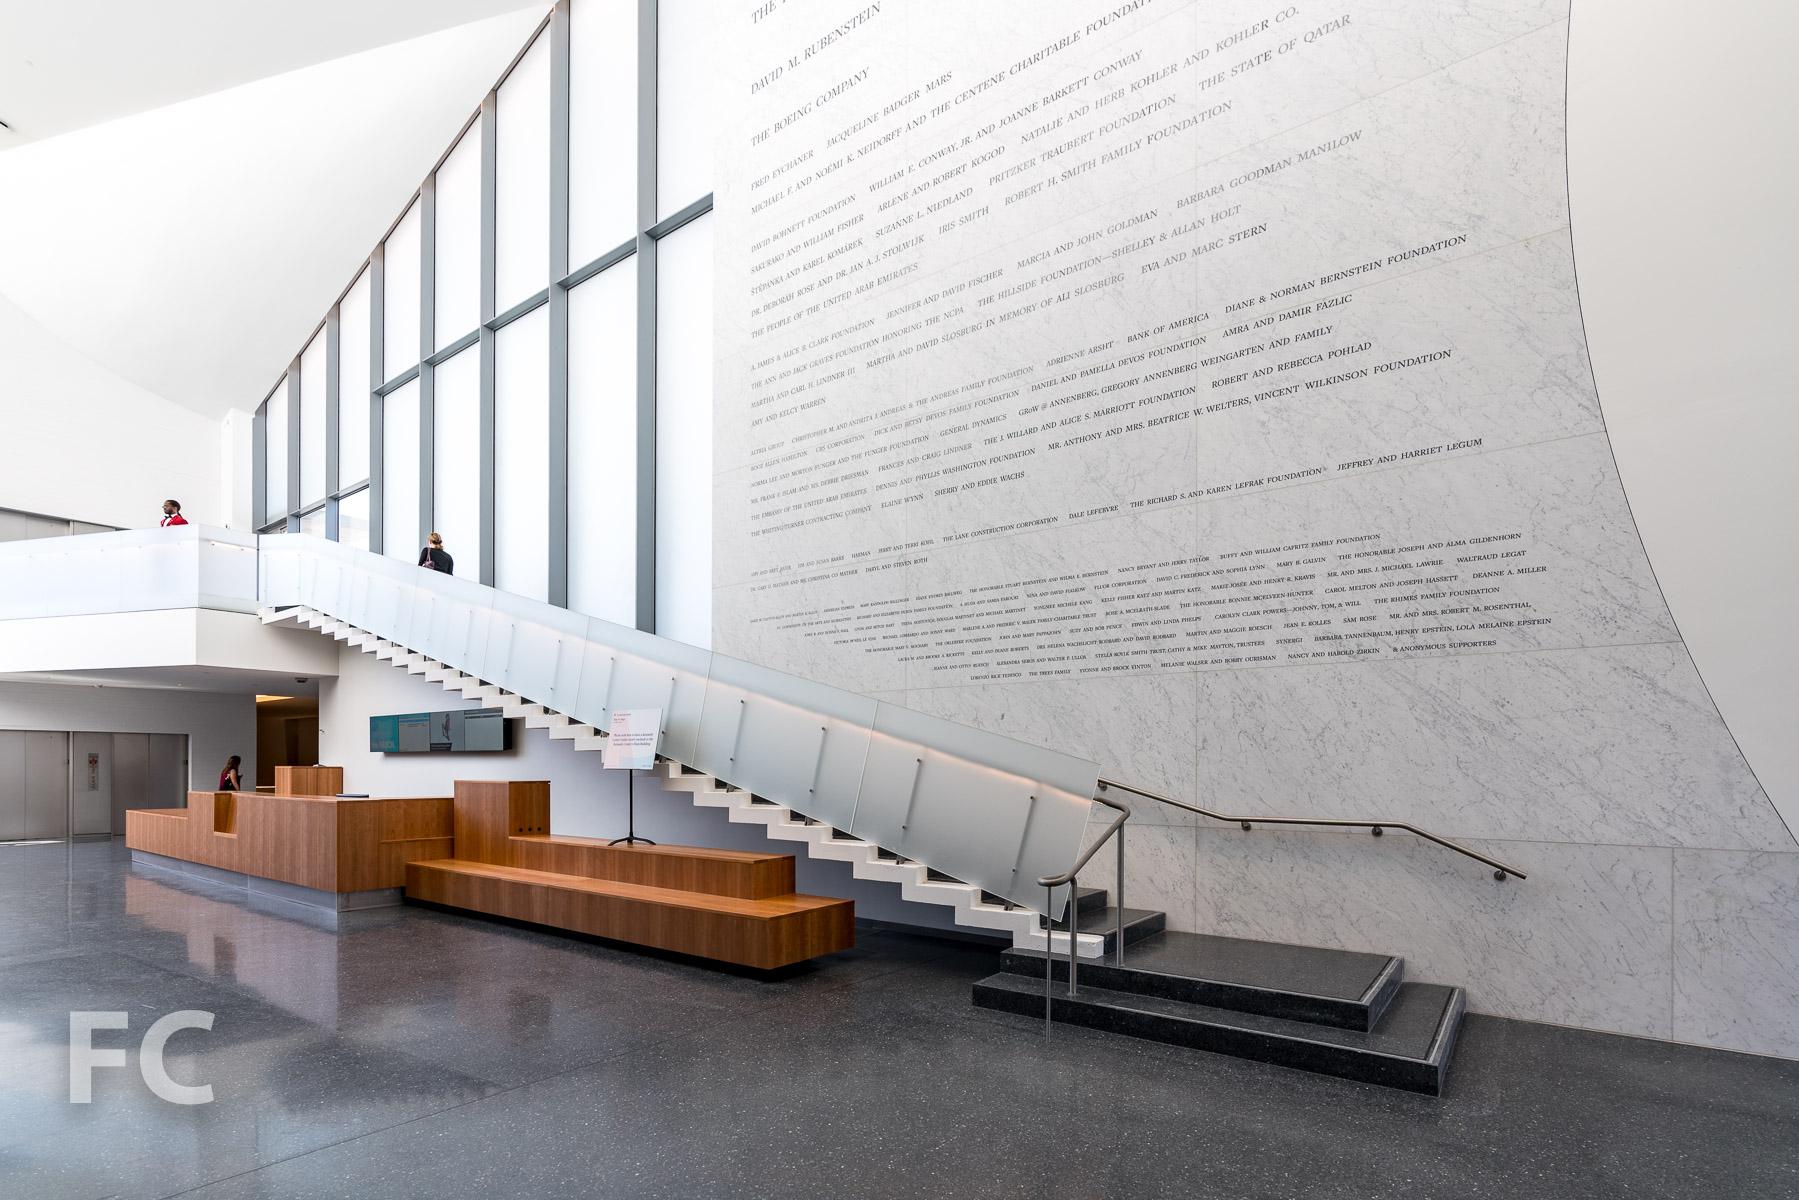 20190831-The Reach at Kennedy Center-DSC05211.jpg